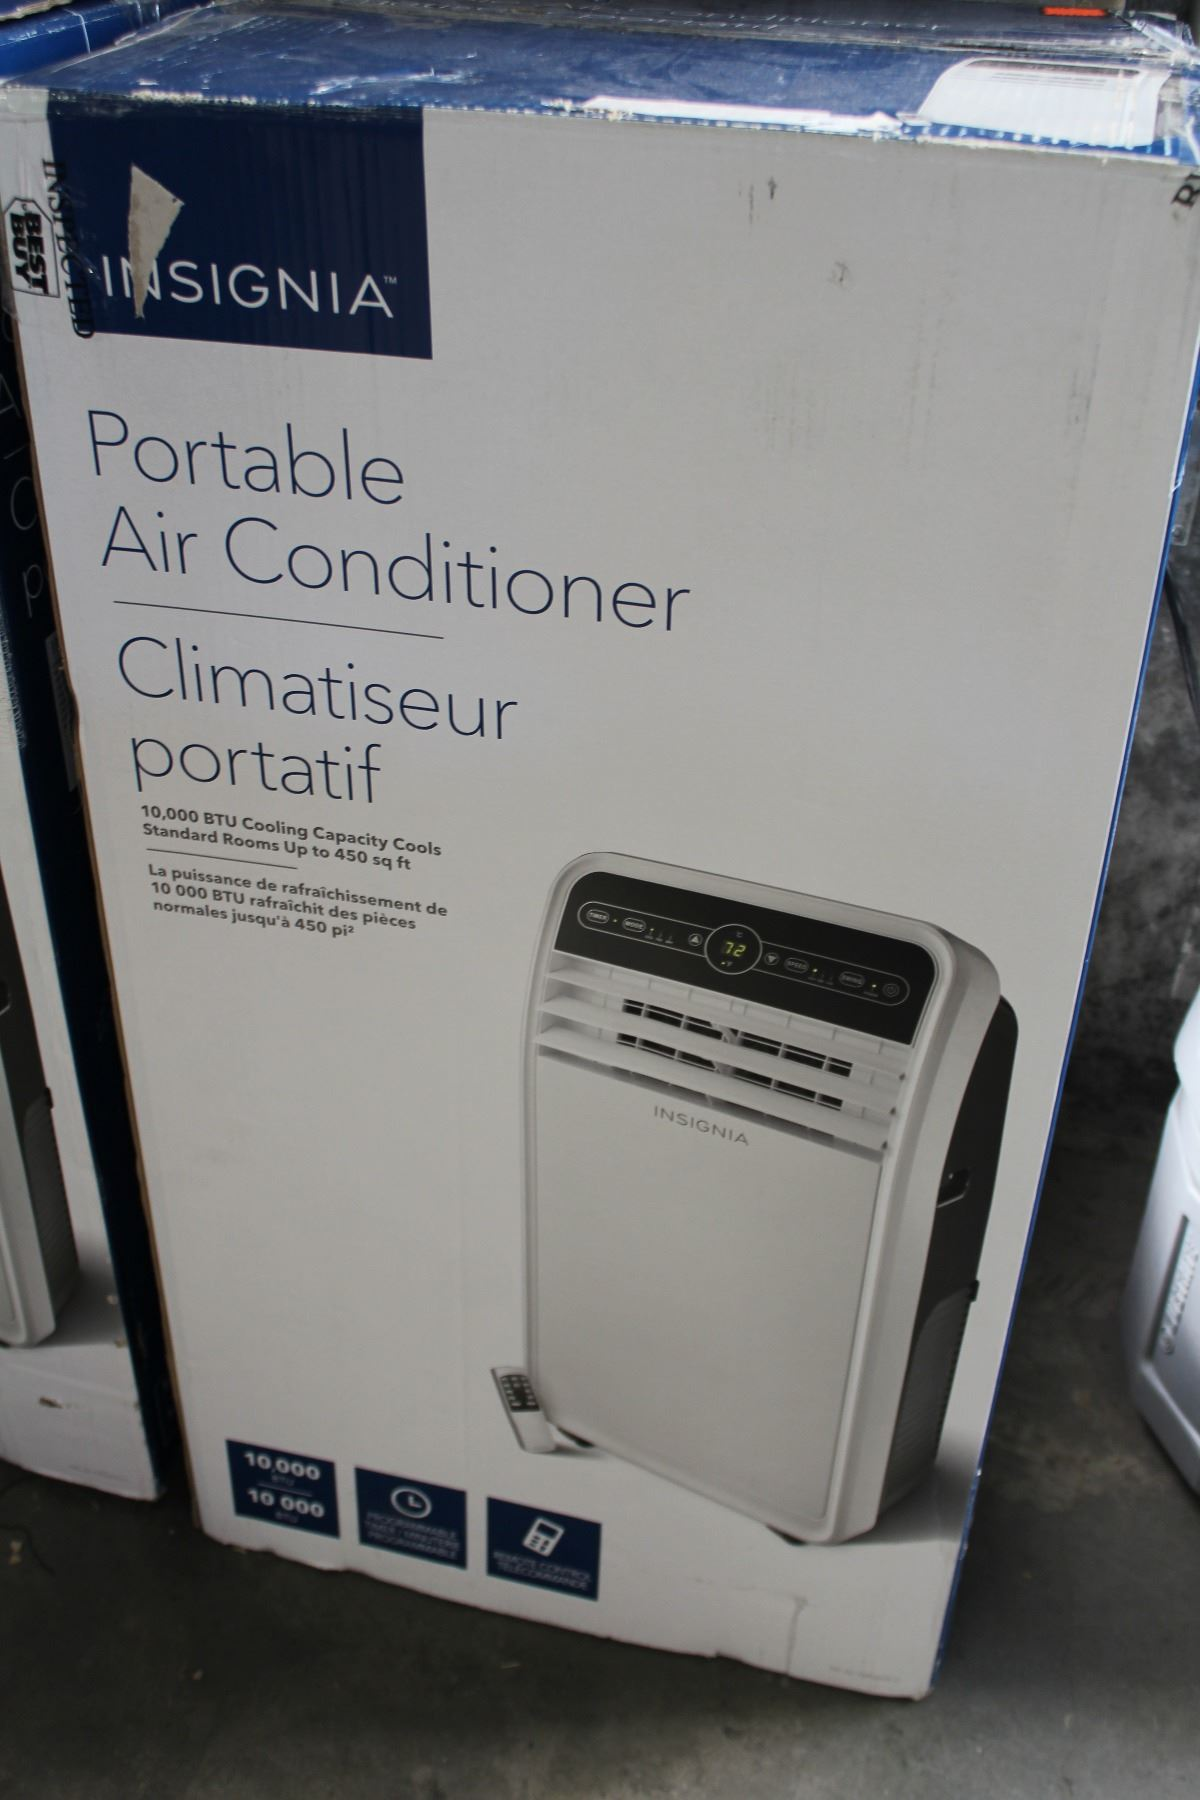 NEW OPEN BOX INSIGNIA 10000 BTU PORTABLE AIR CONDITIONER, COMPLETE WITH ALL  ORIGINAL ACCESSORIES